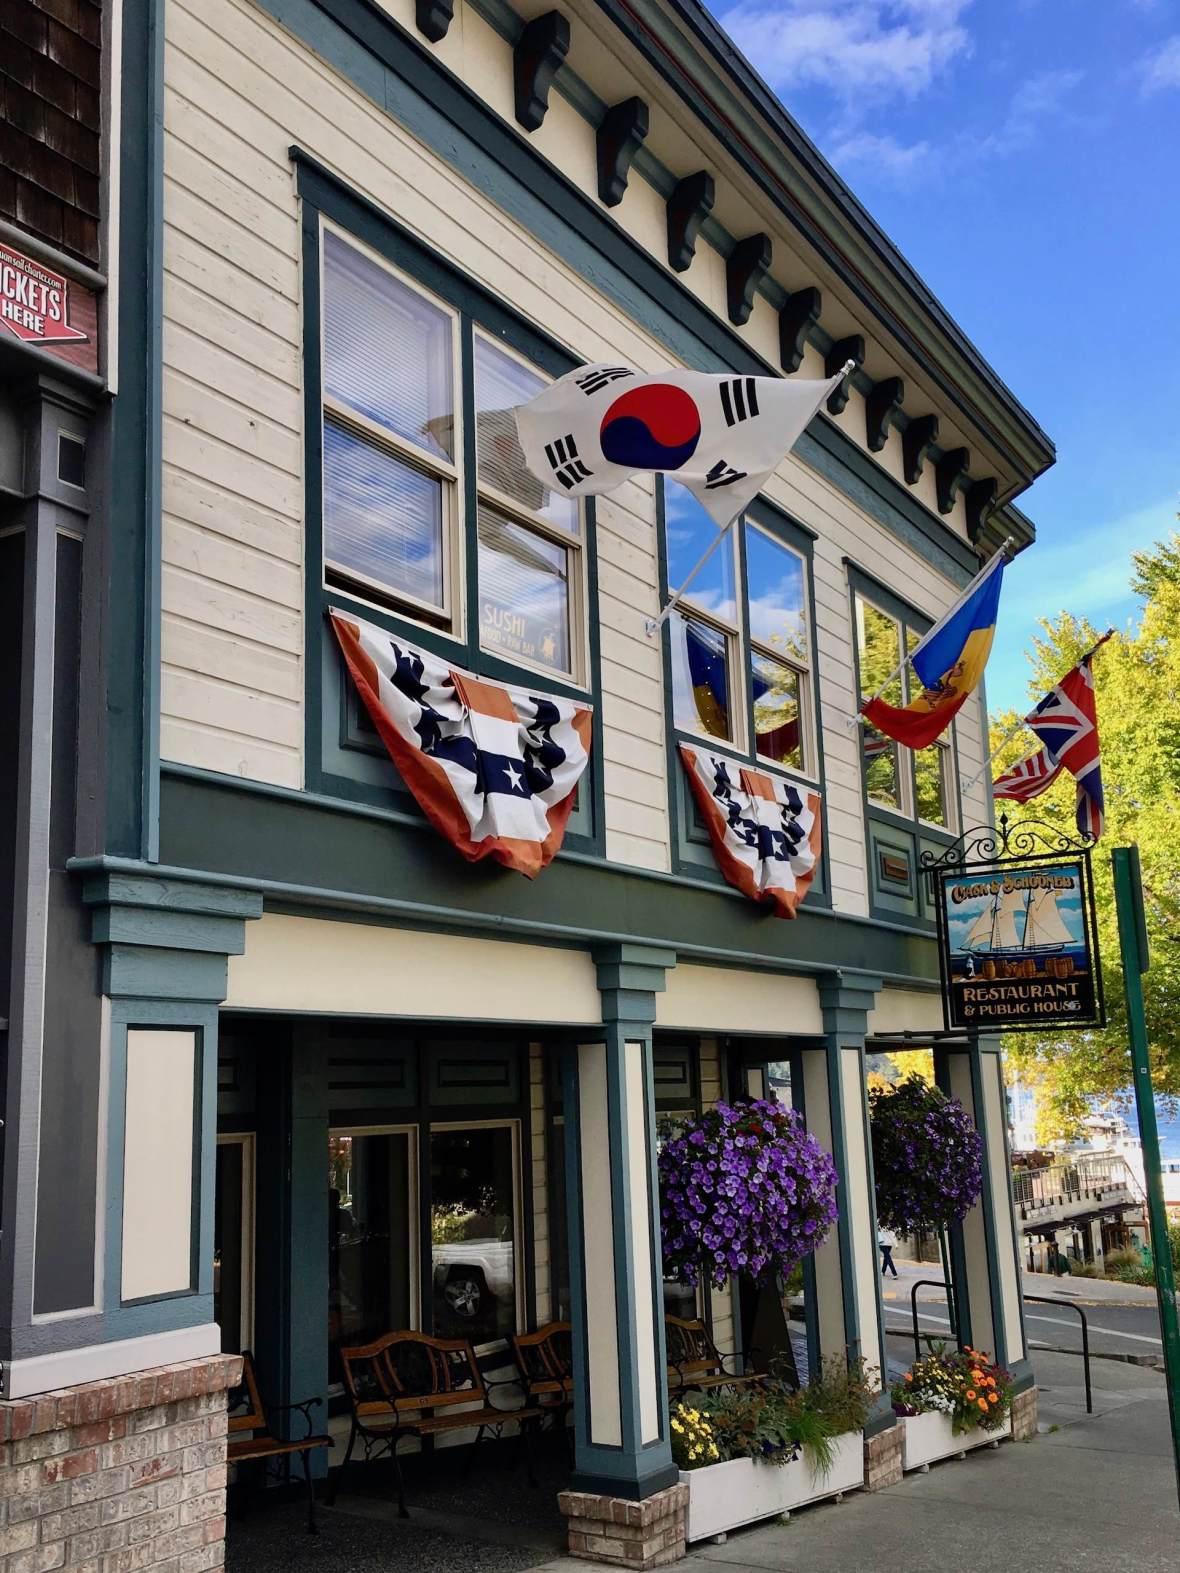 Cask & Schooner Restaurant & Public House in Friday Harbor, Washington